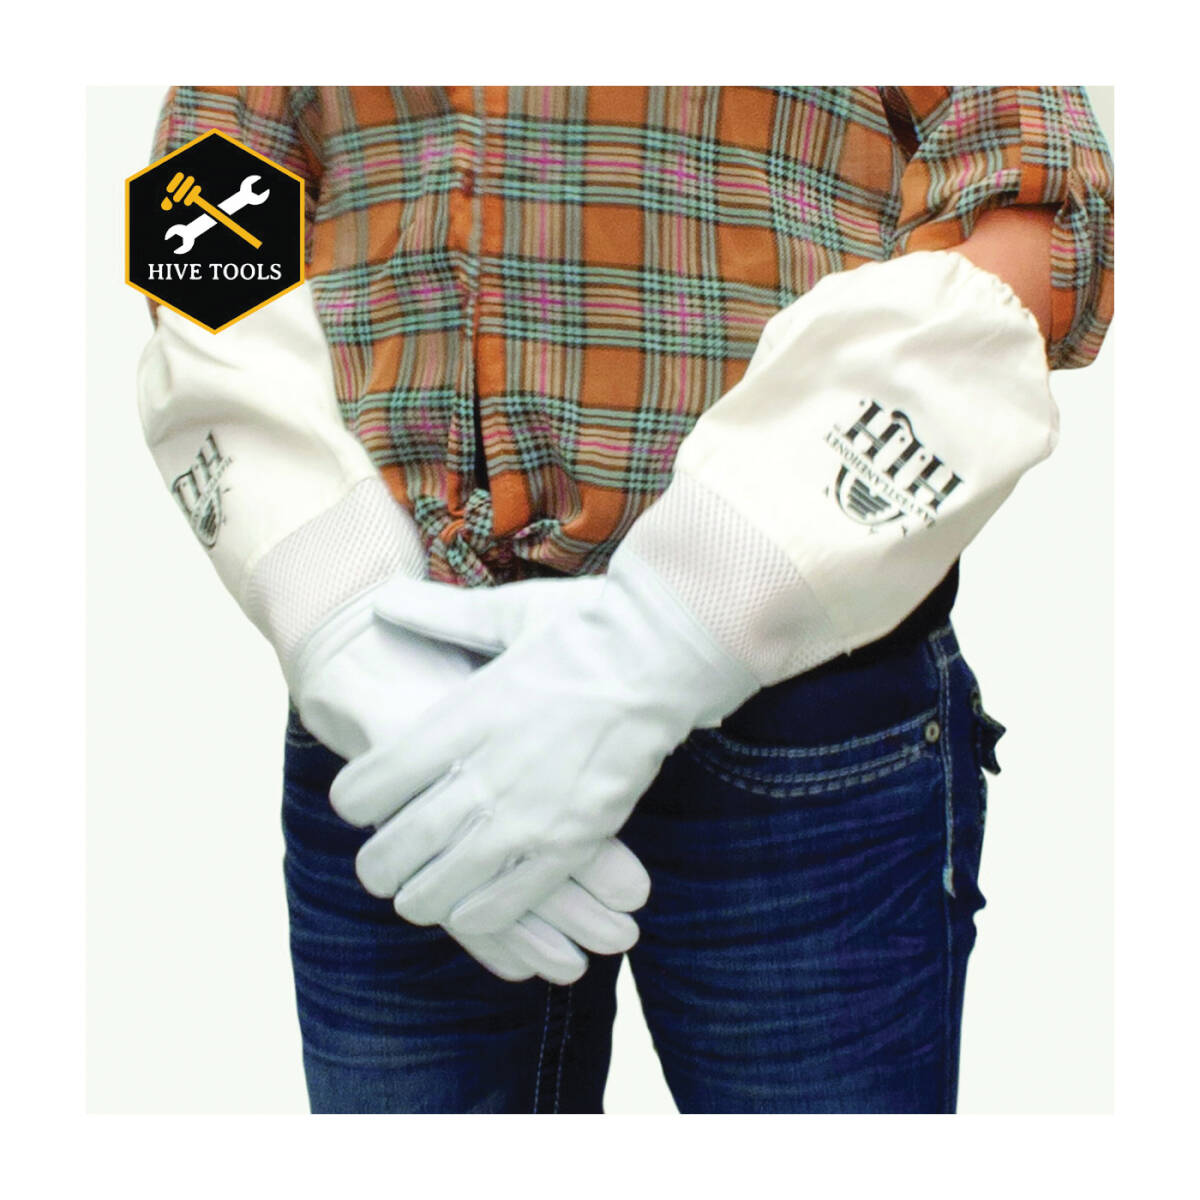 HARVEST LANE HONEY CLOTHGM-103